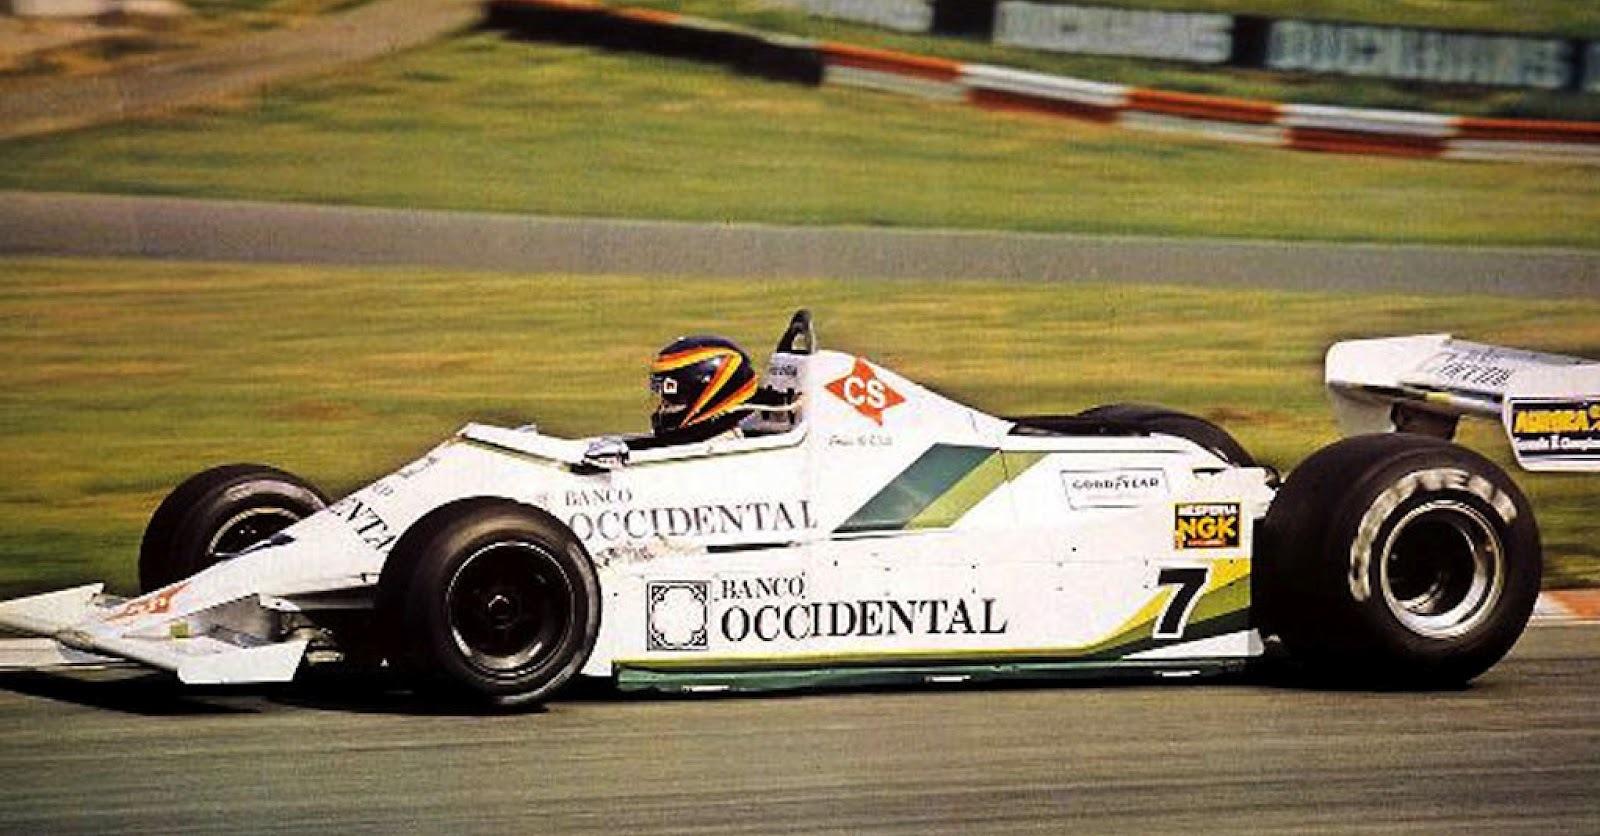 Emilio de Villota 1980 F1 Reino Unido